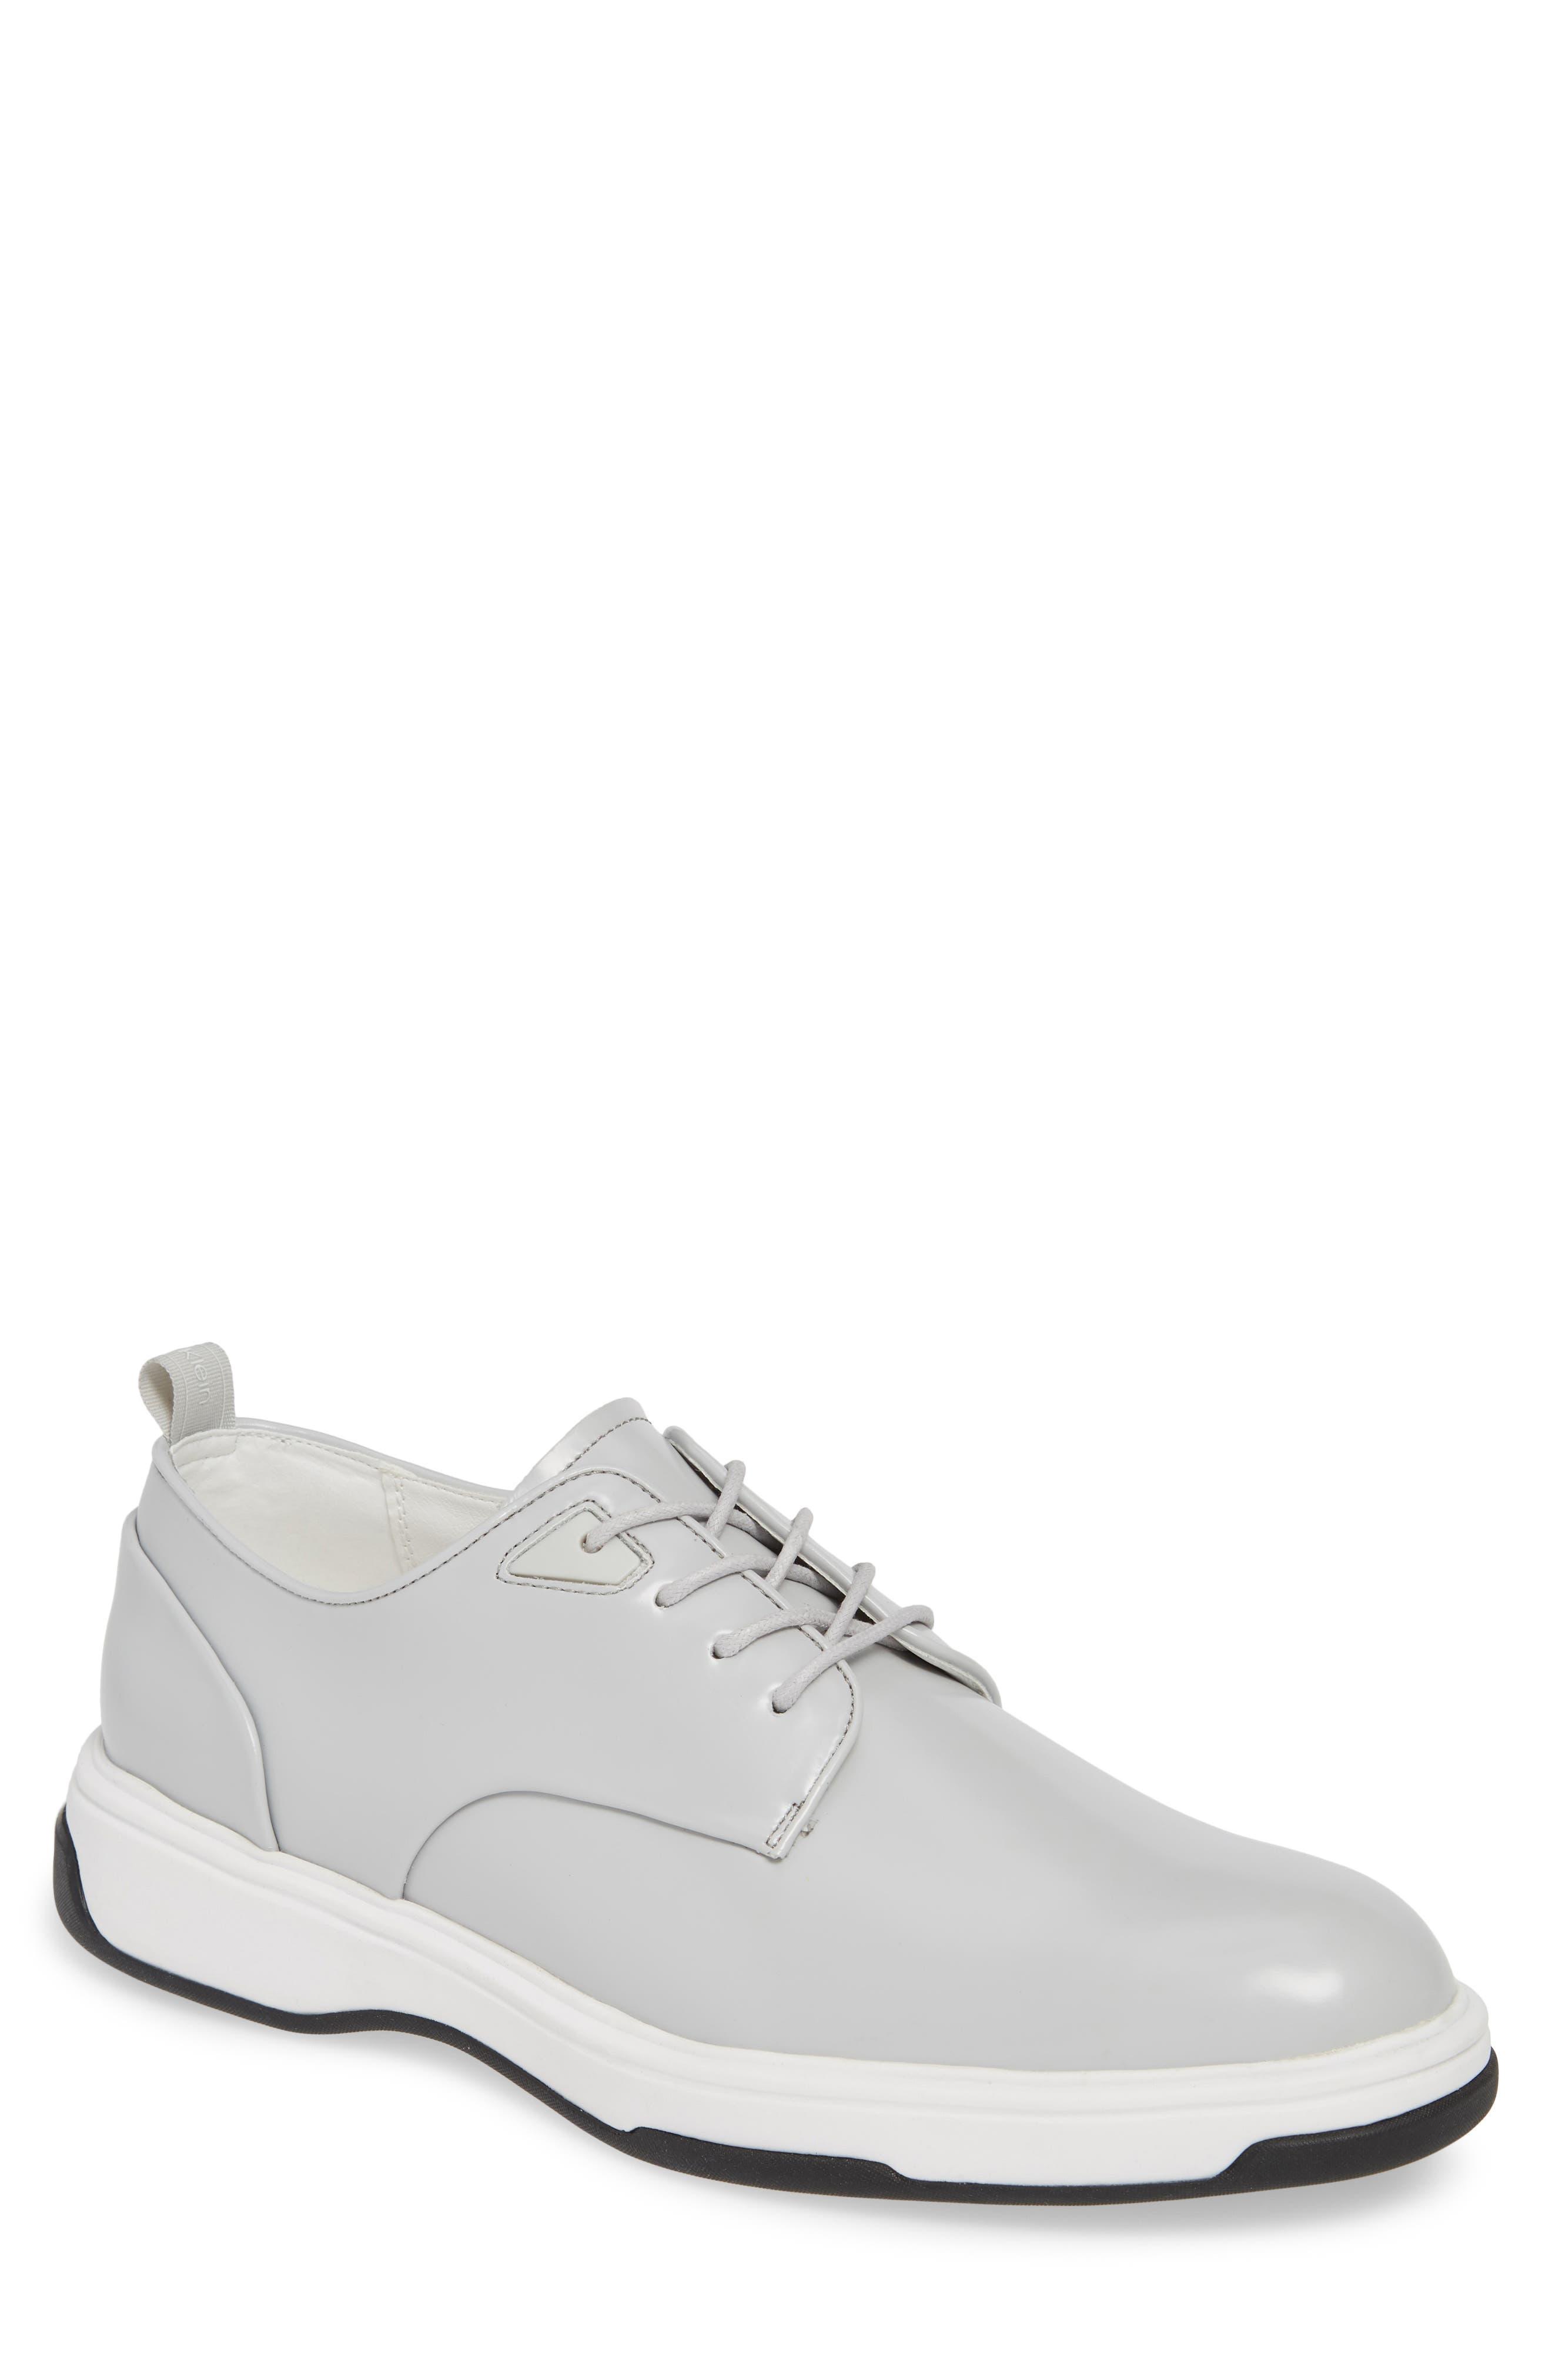 Calvin Klein Patsy Sneaker, Grey